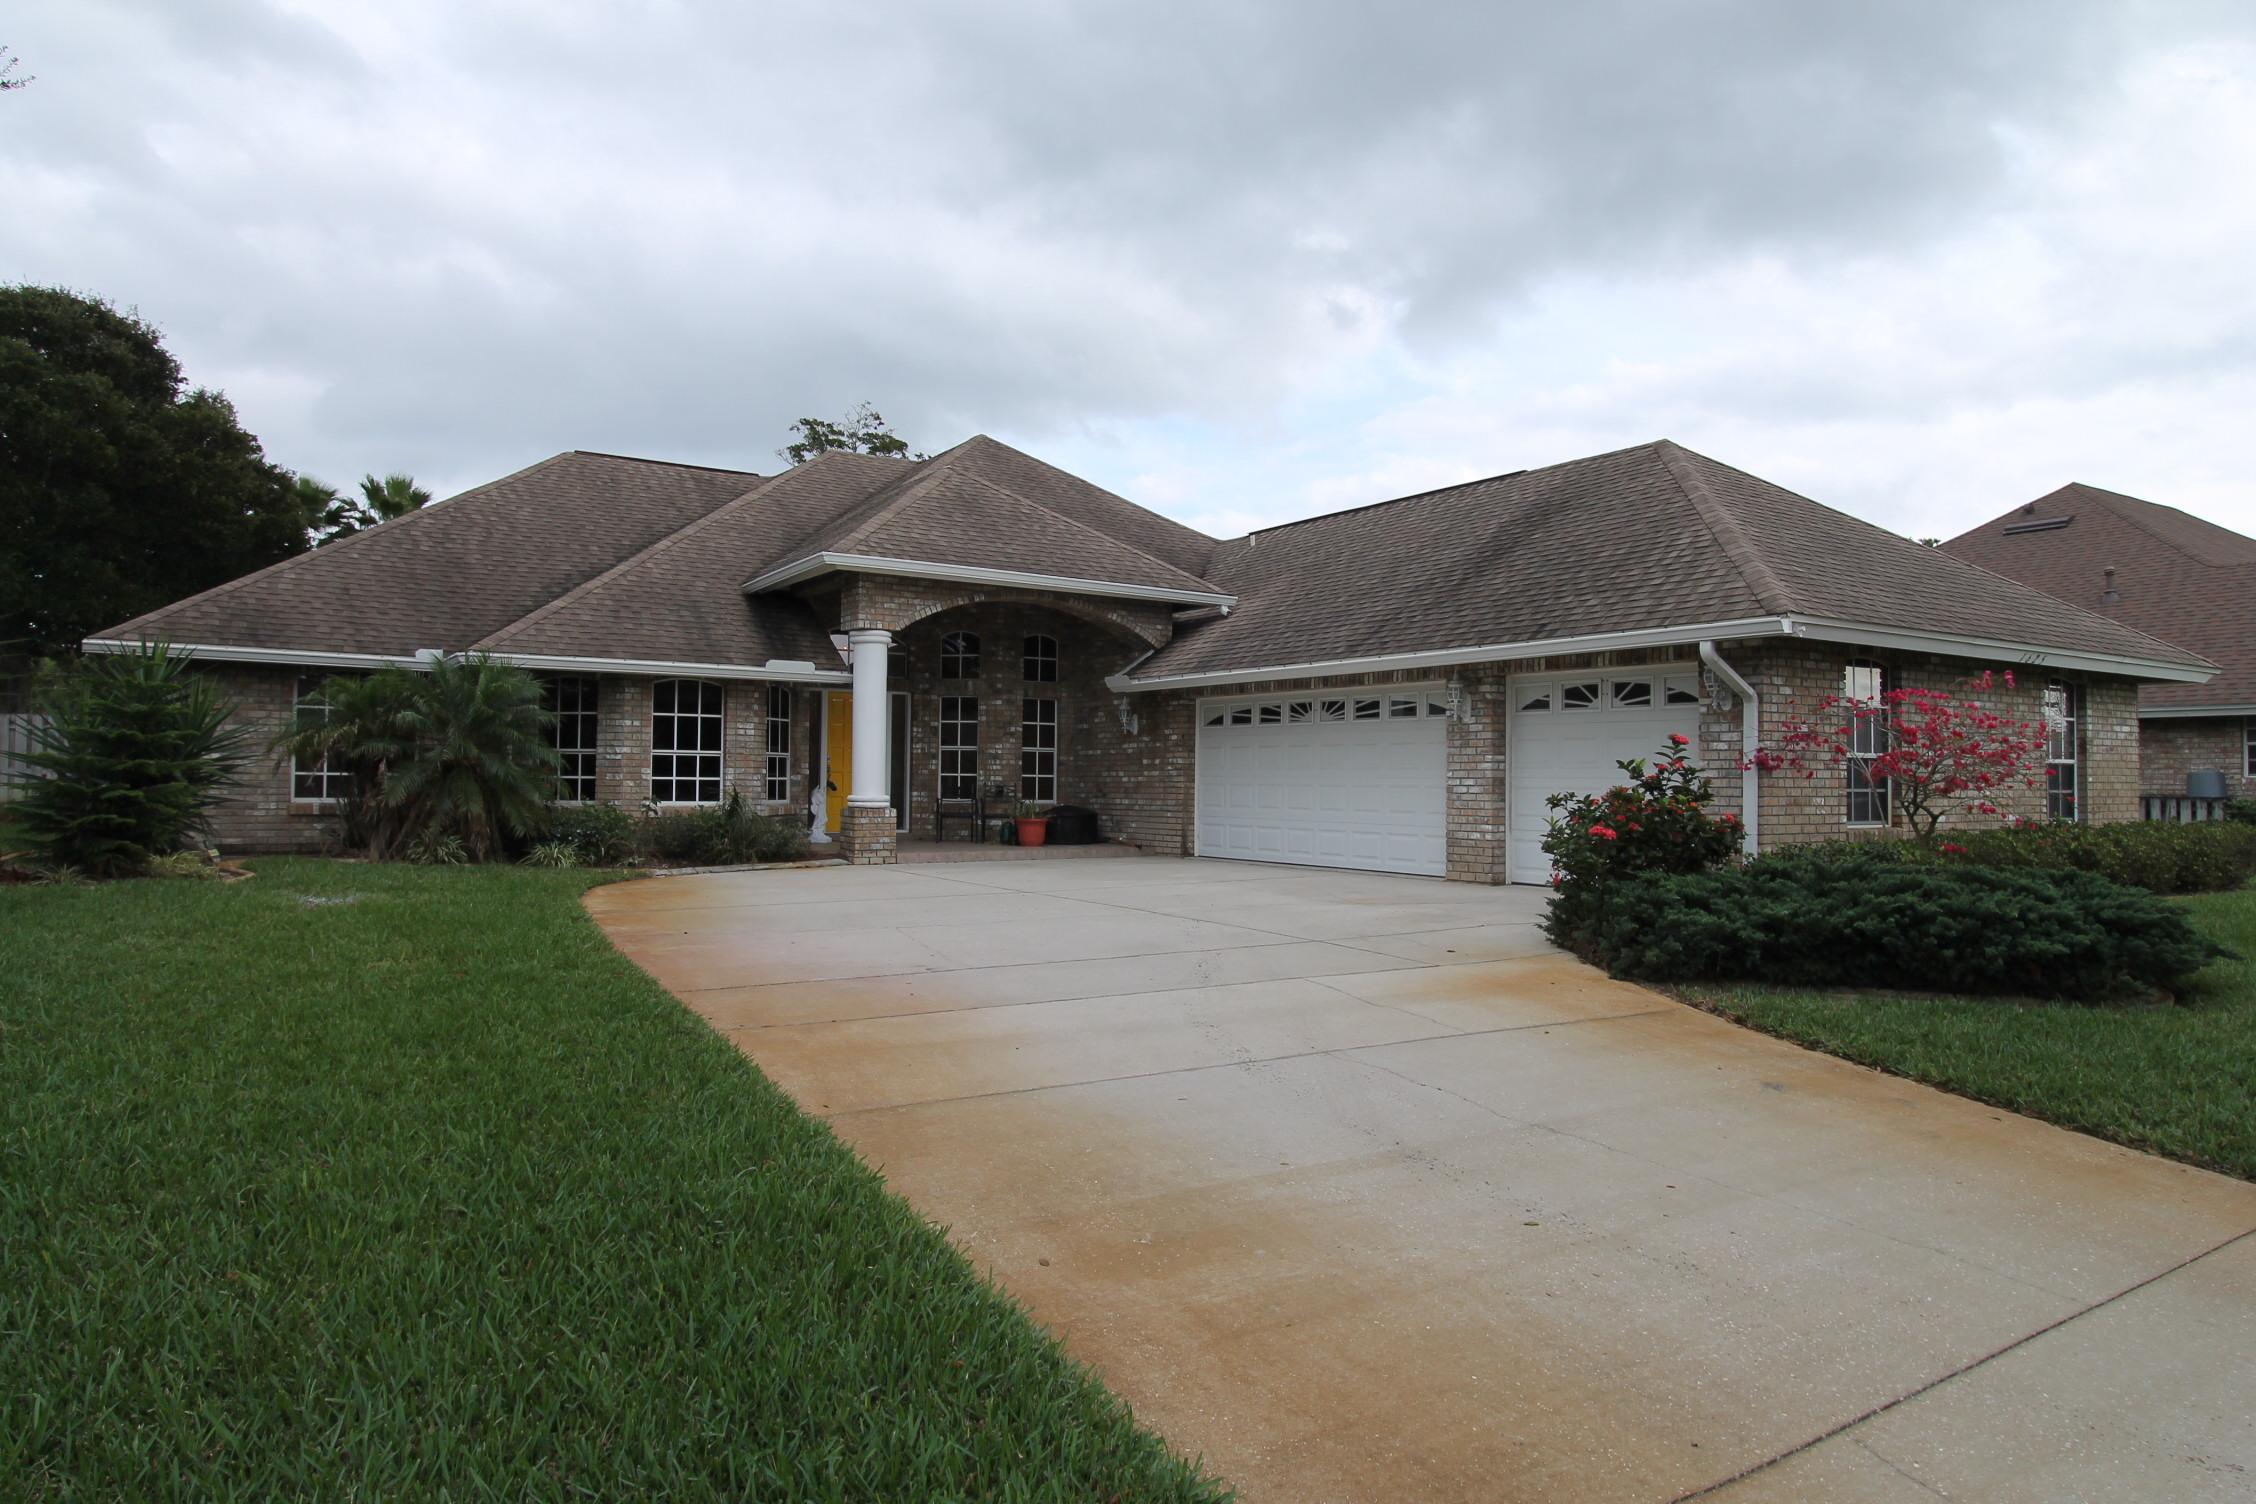 1625 Banana Dr, Titusville, Florida 32780